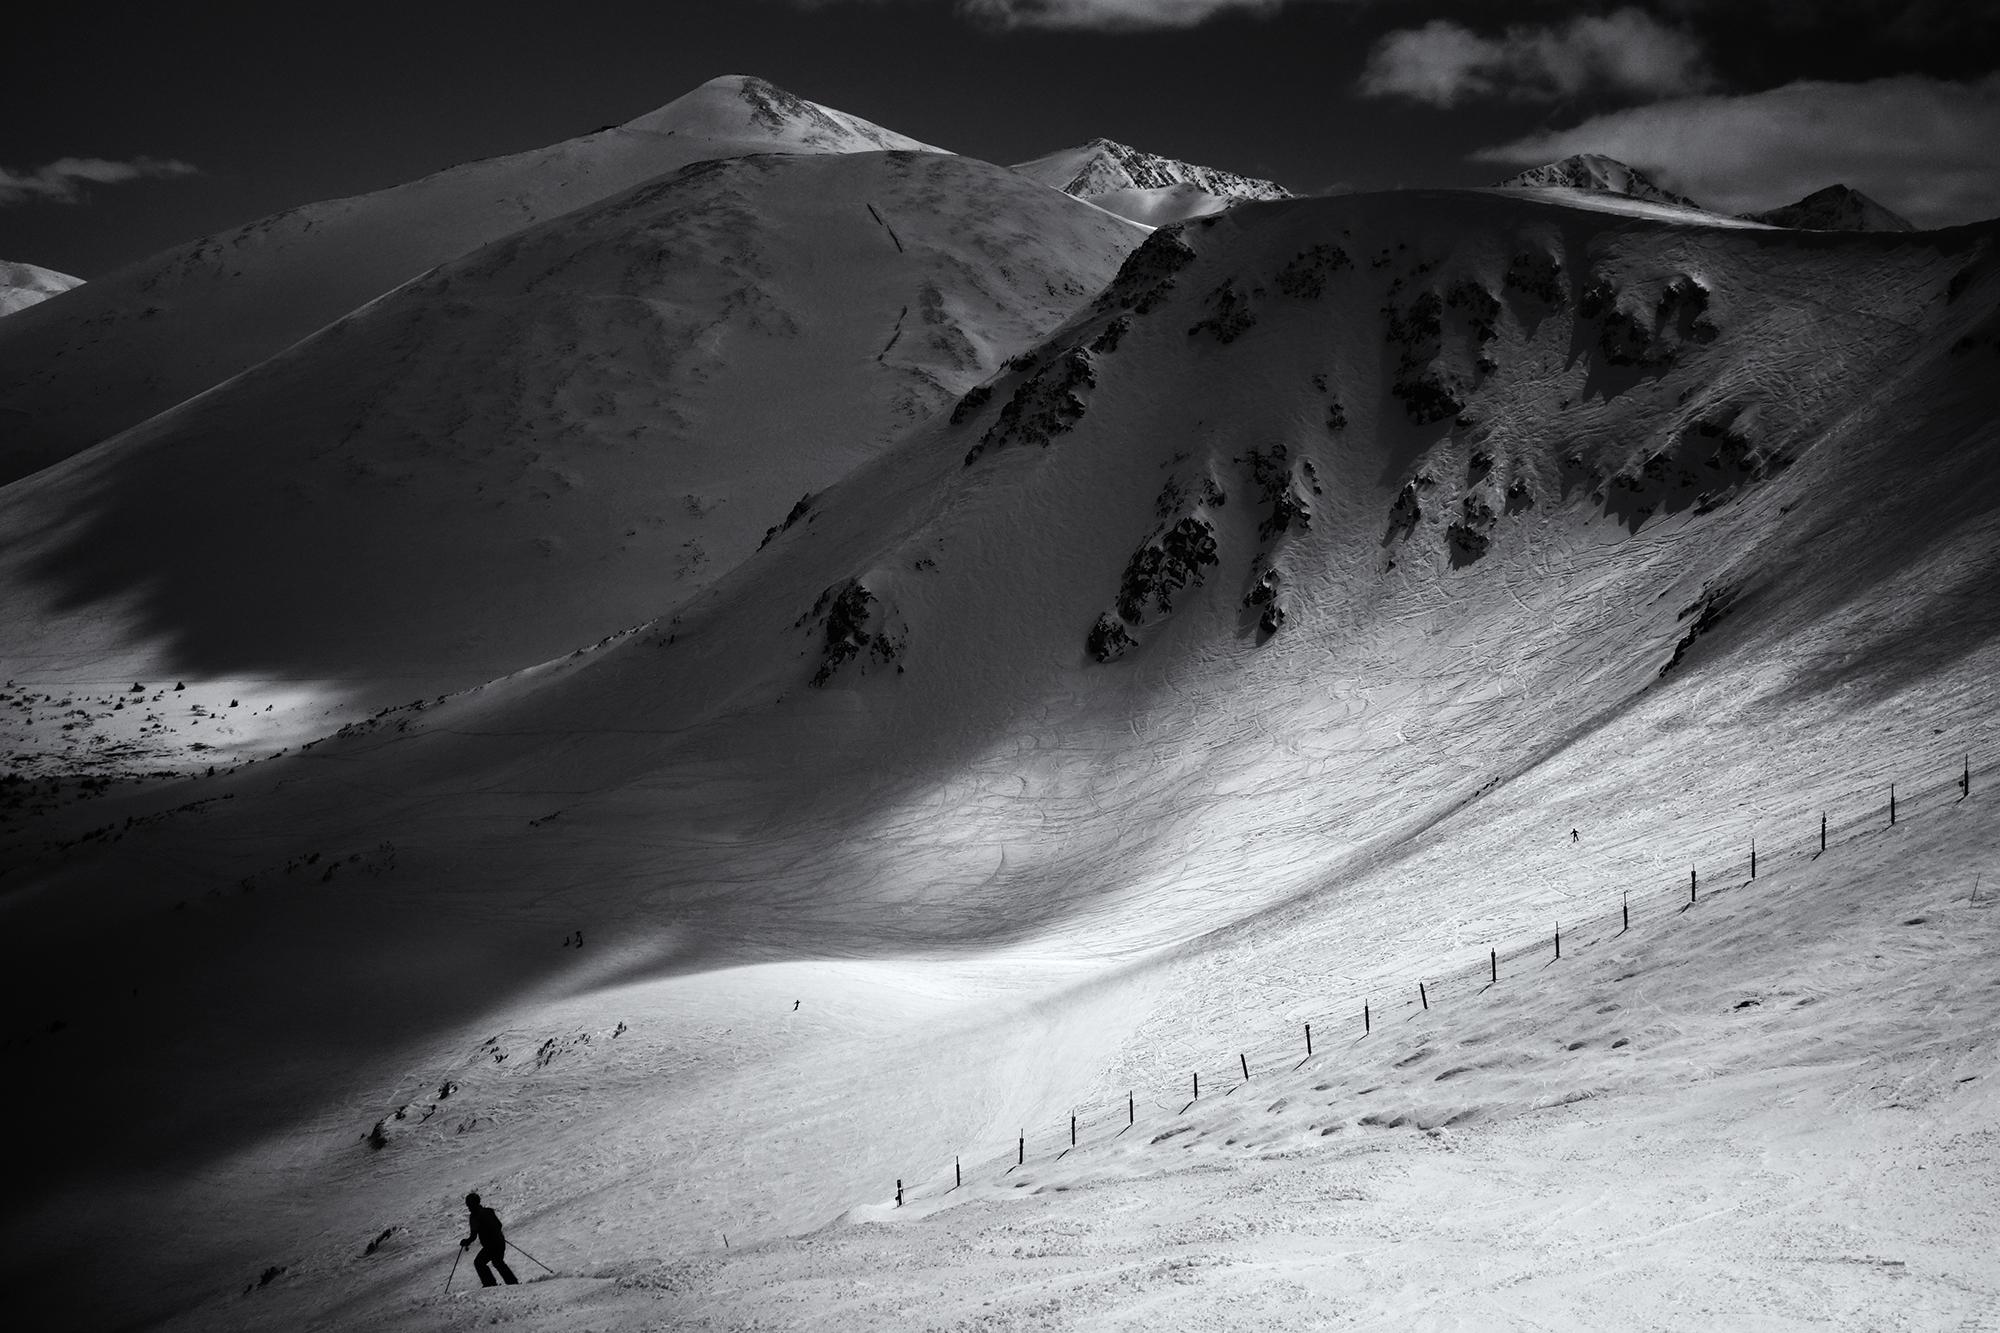 A Skier's Landscape. Breckenridge, Colorado, 2017